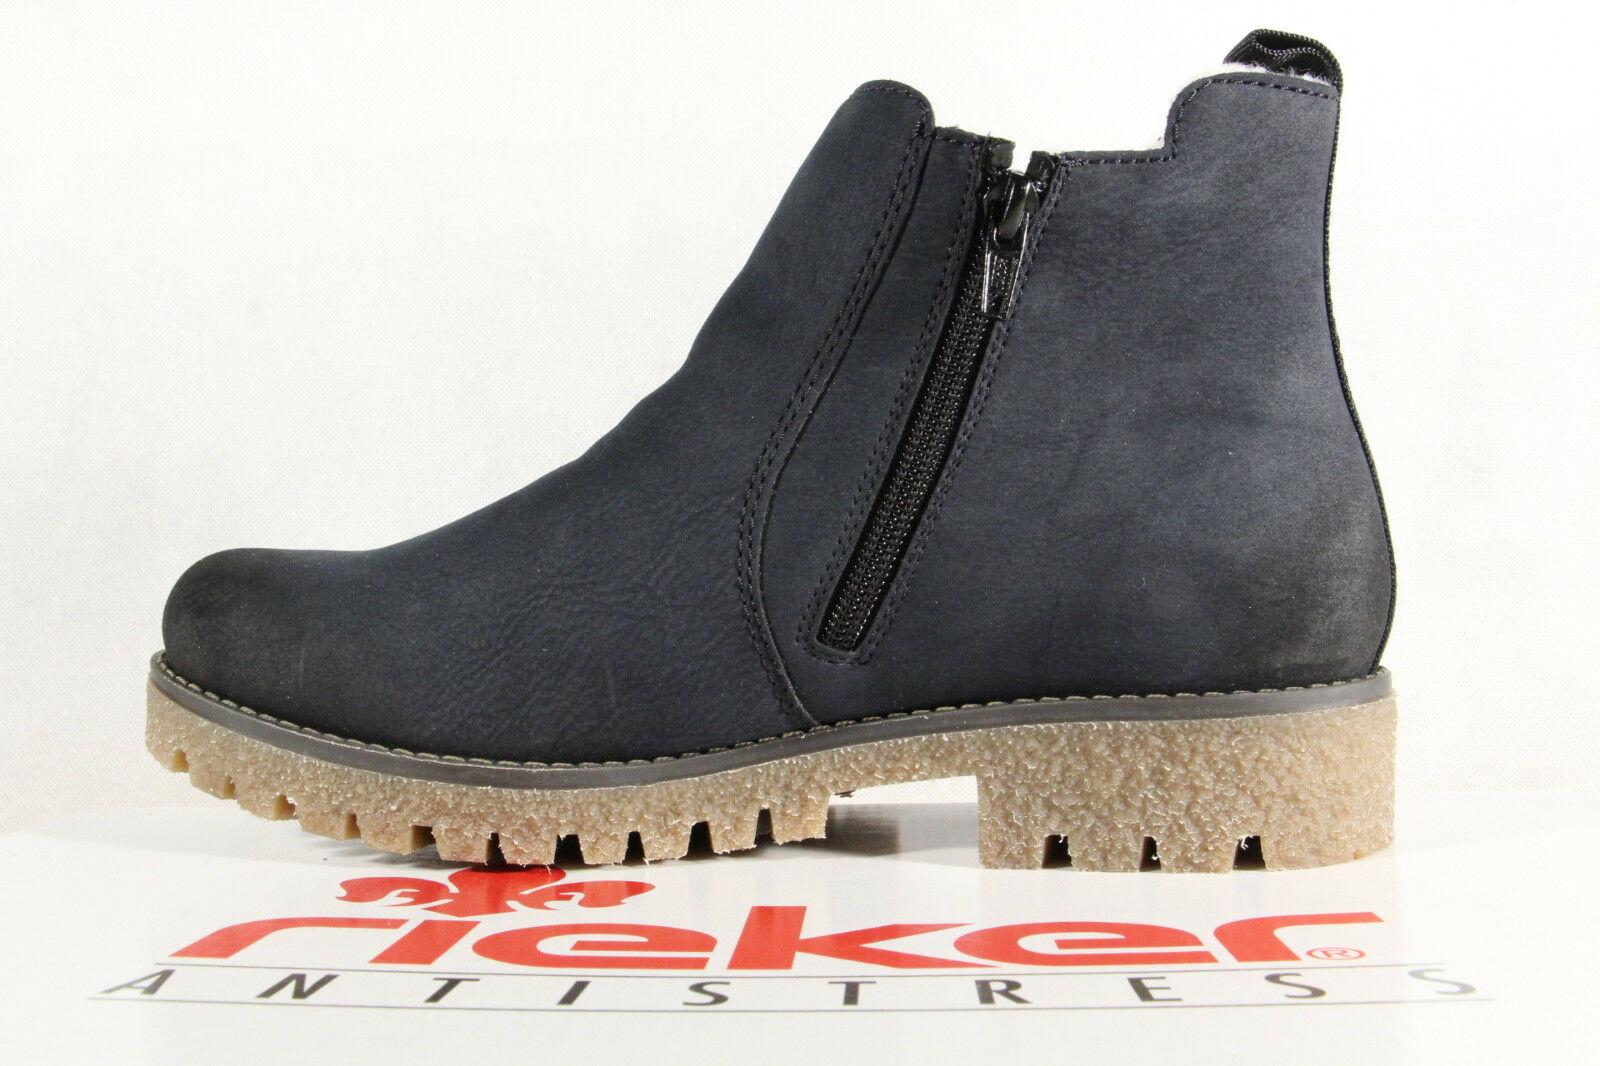 2ed8a2689bcd Rieker Stiefel Stiefelette Boots, Winterstiefel blau 79884 NEU ...